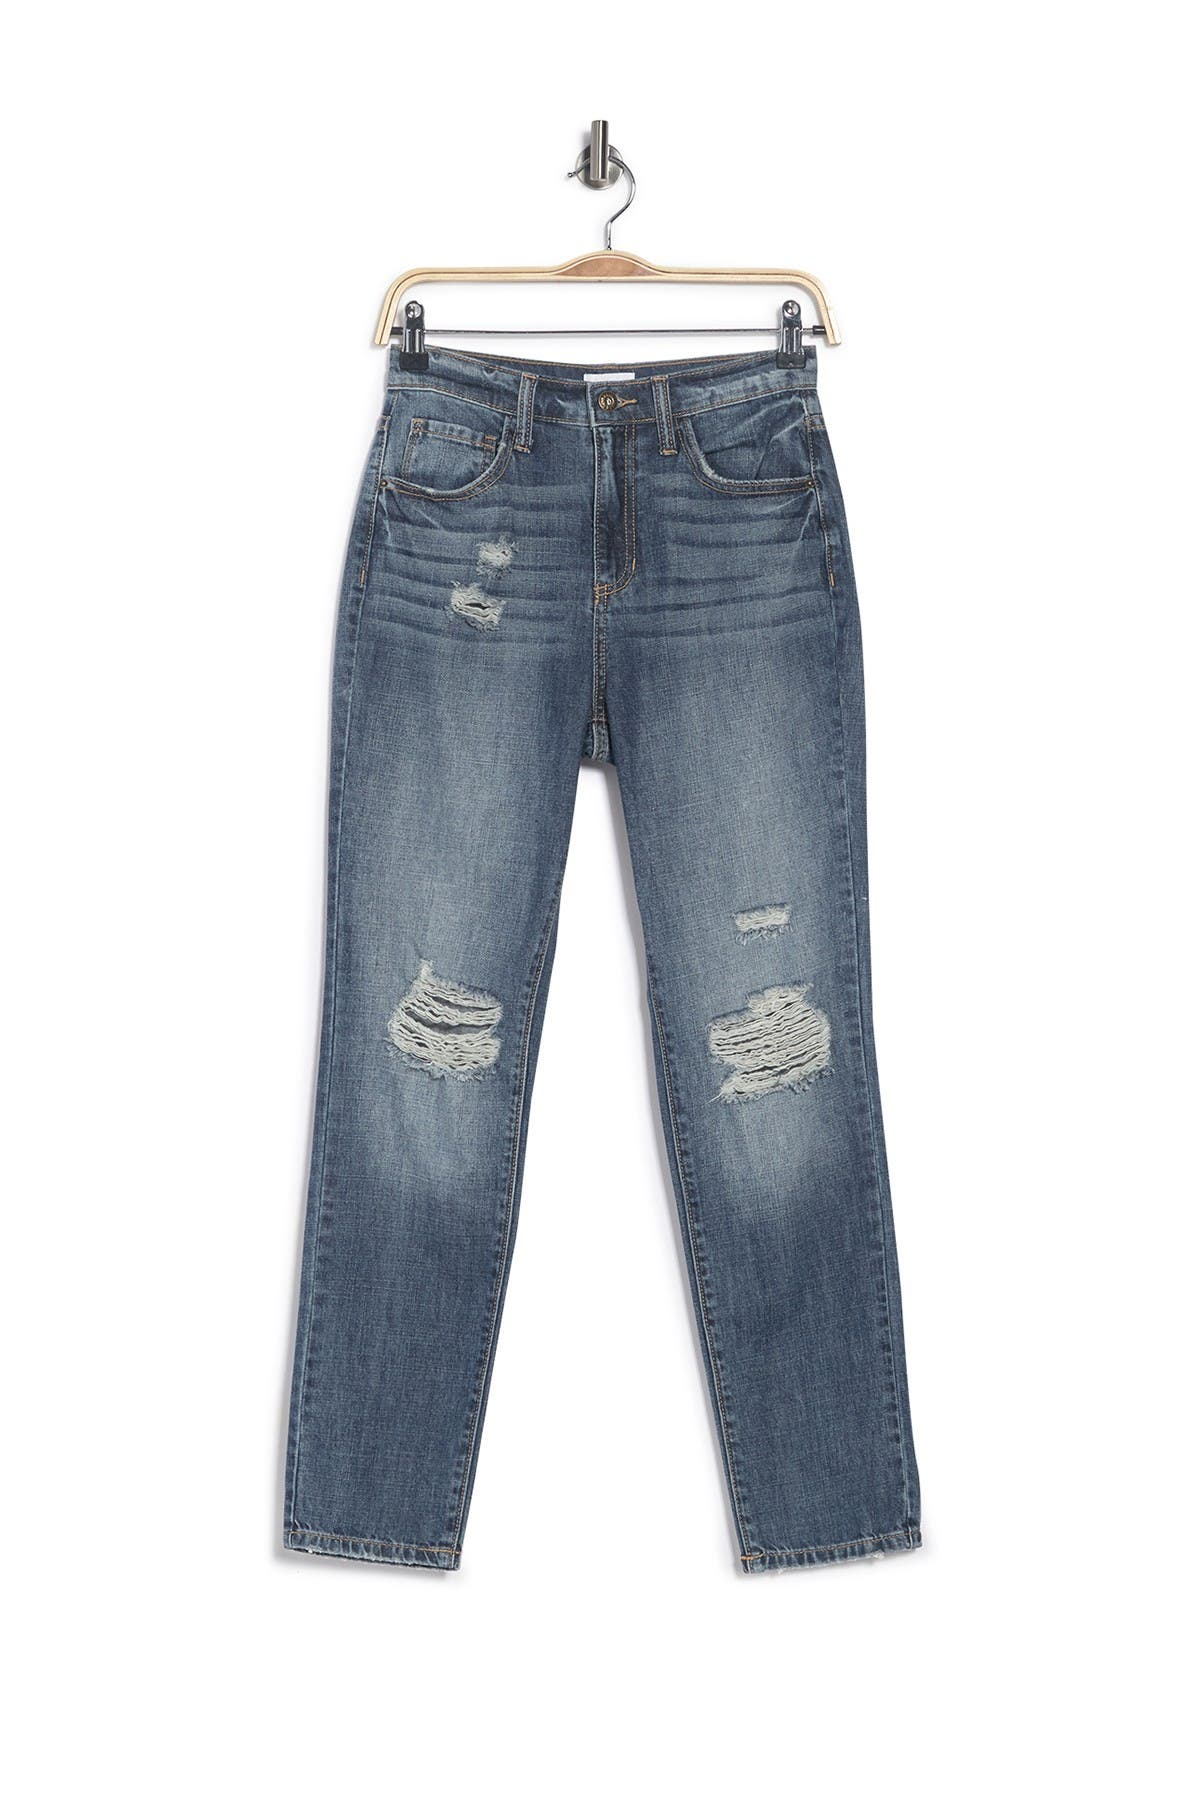 Image of Sneak Peek Denim High Rise 90s Retro Skinny Jeans